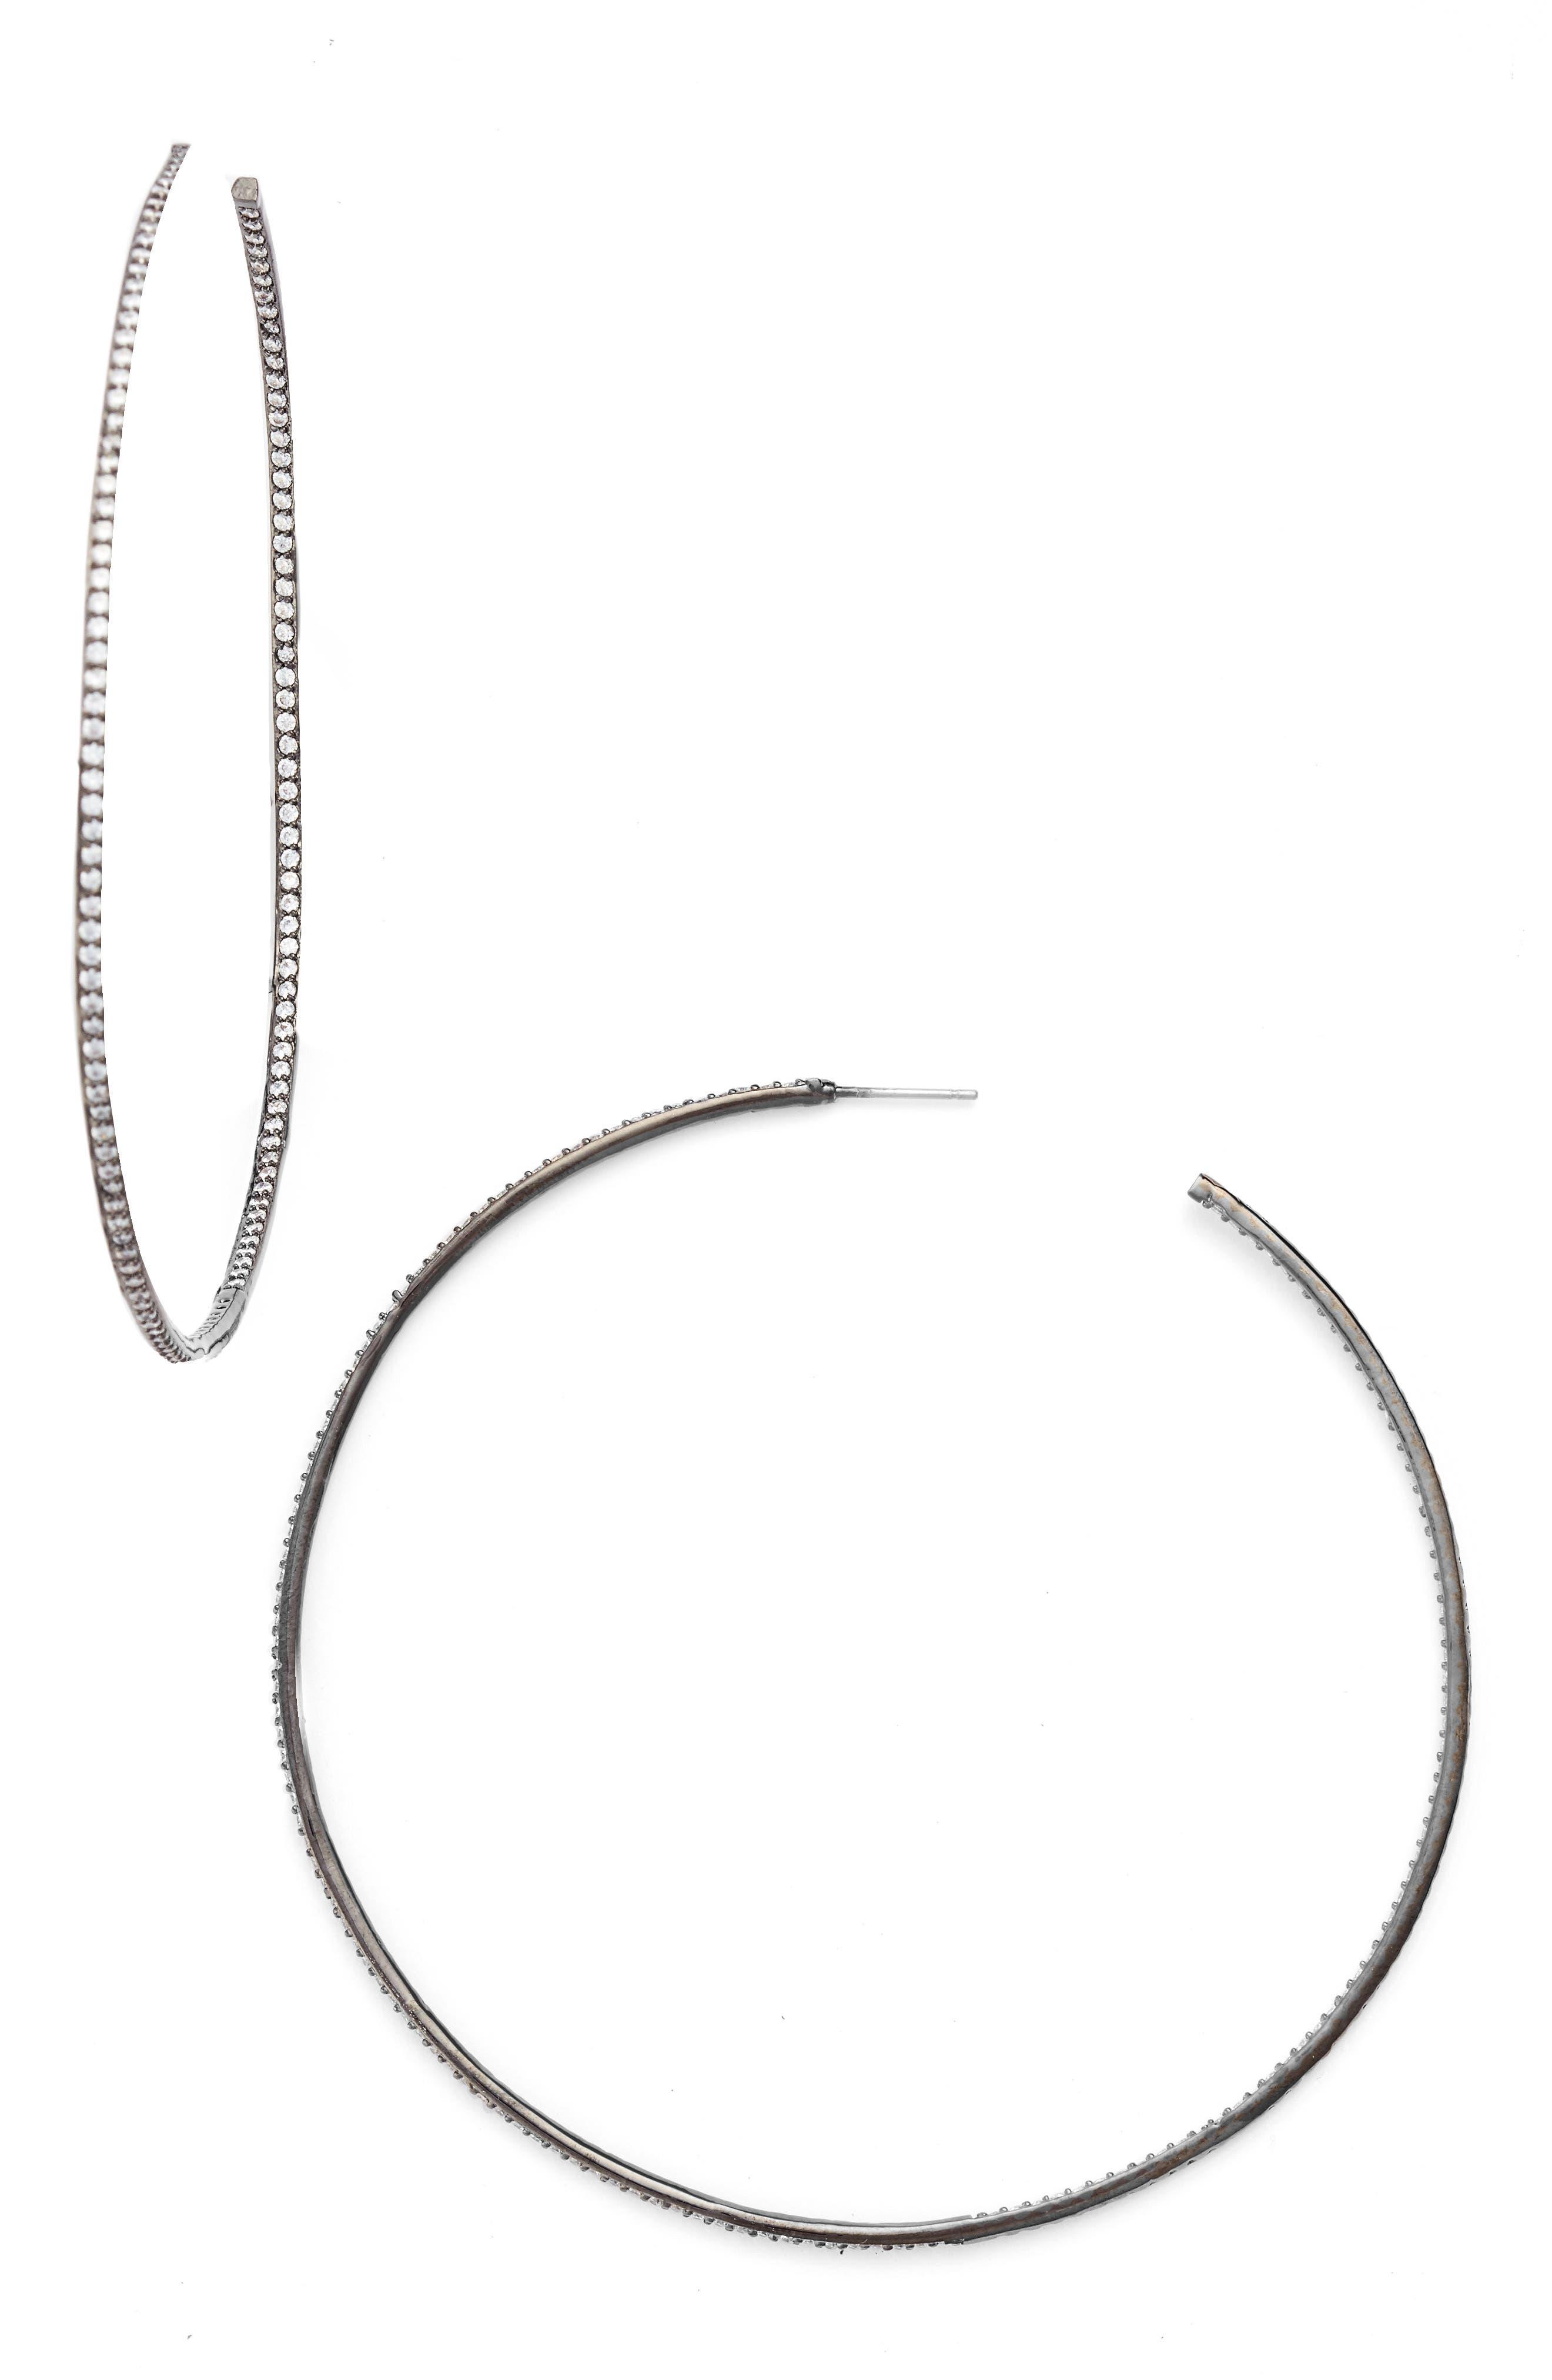 Alternate Image 1 Selected - CZ by Kenneth Jay Lane Skinny Inside Out Hoop Earrings